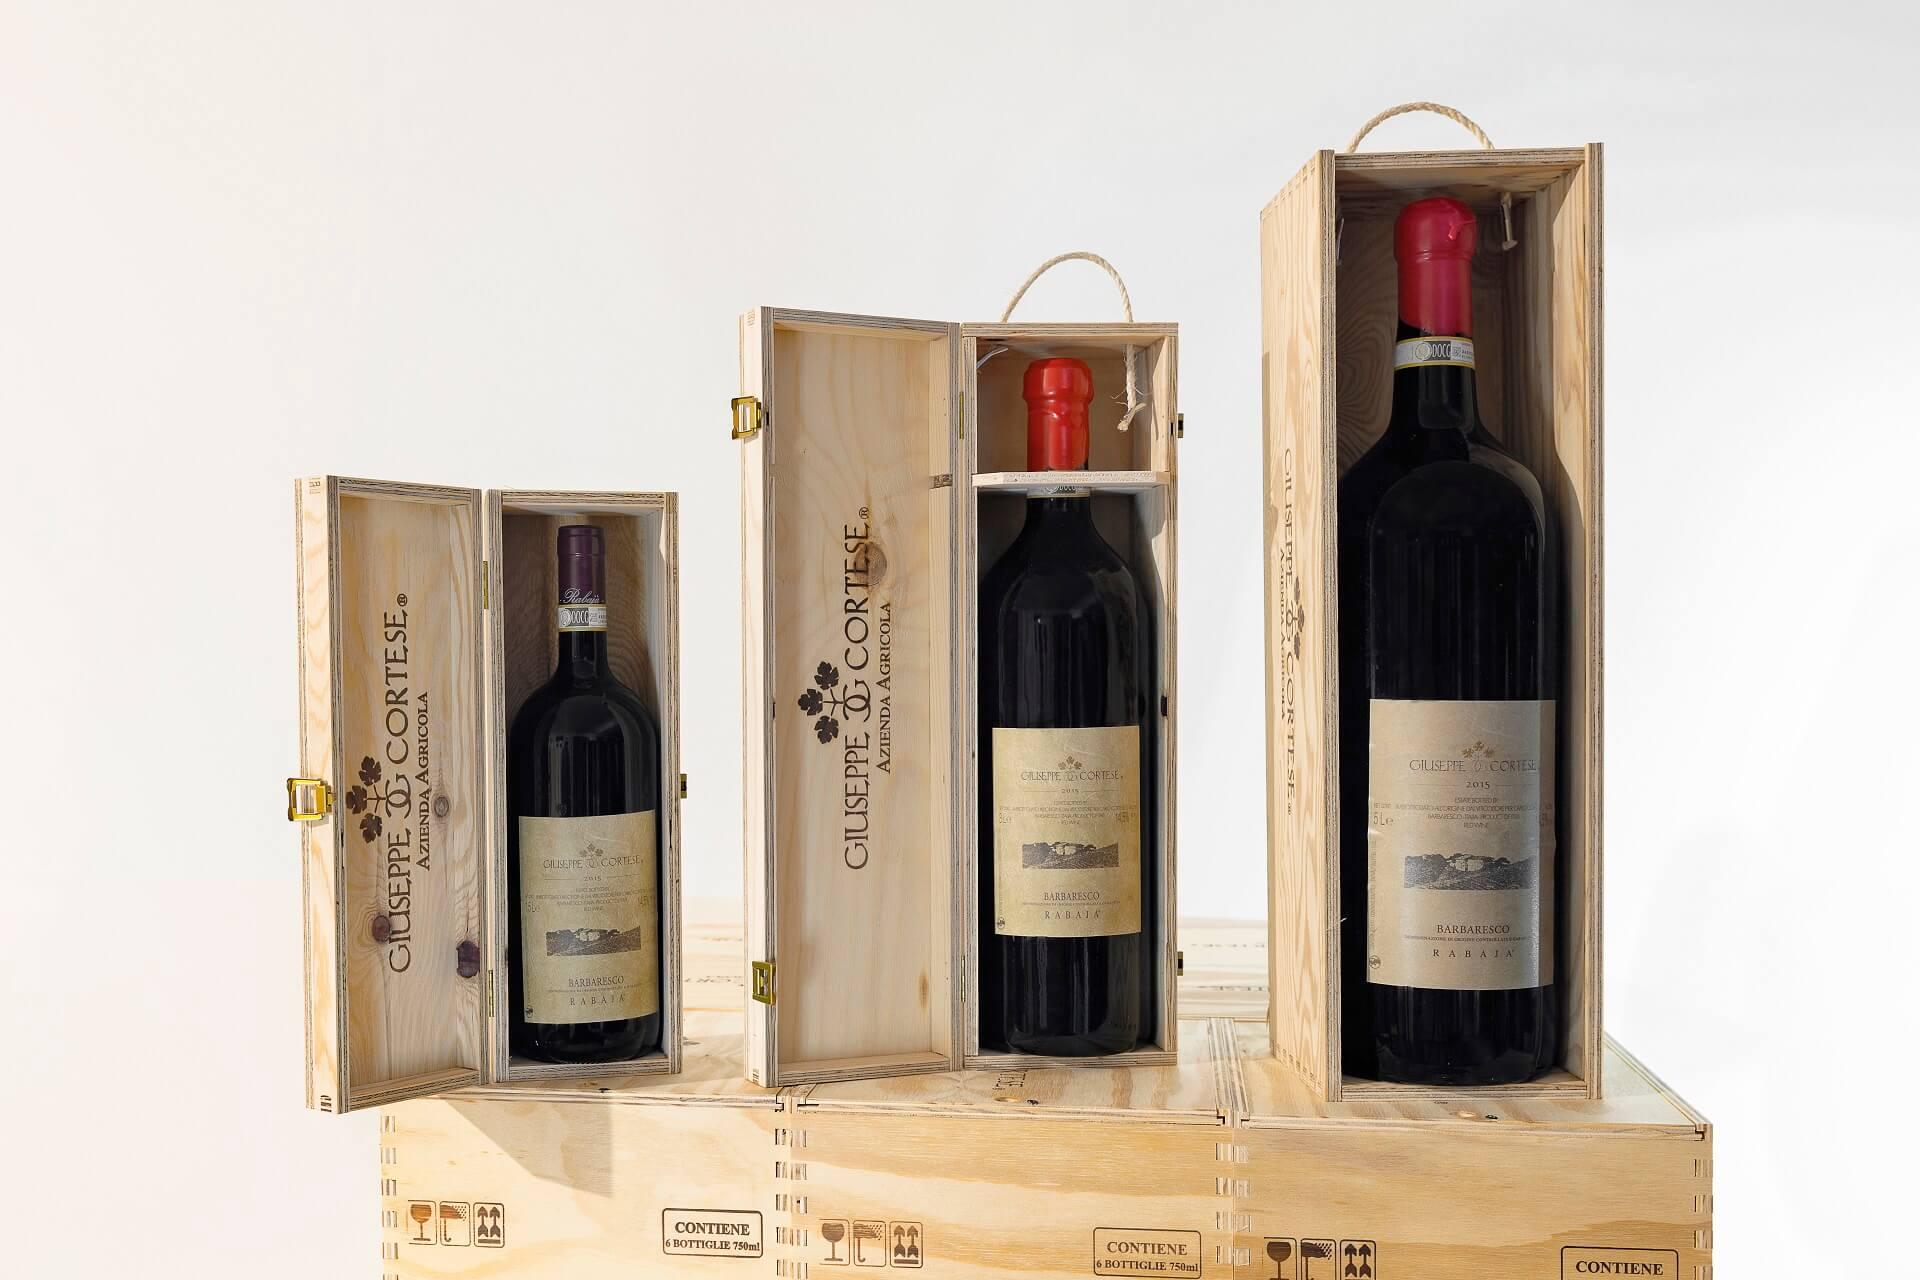 vini giuseppe cortese, vendita vini cortese, barbaresco cortese giuseppe